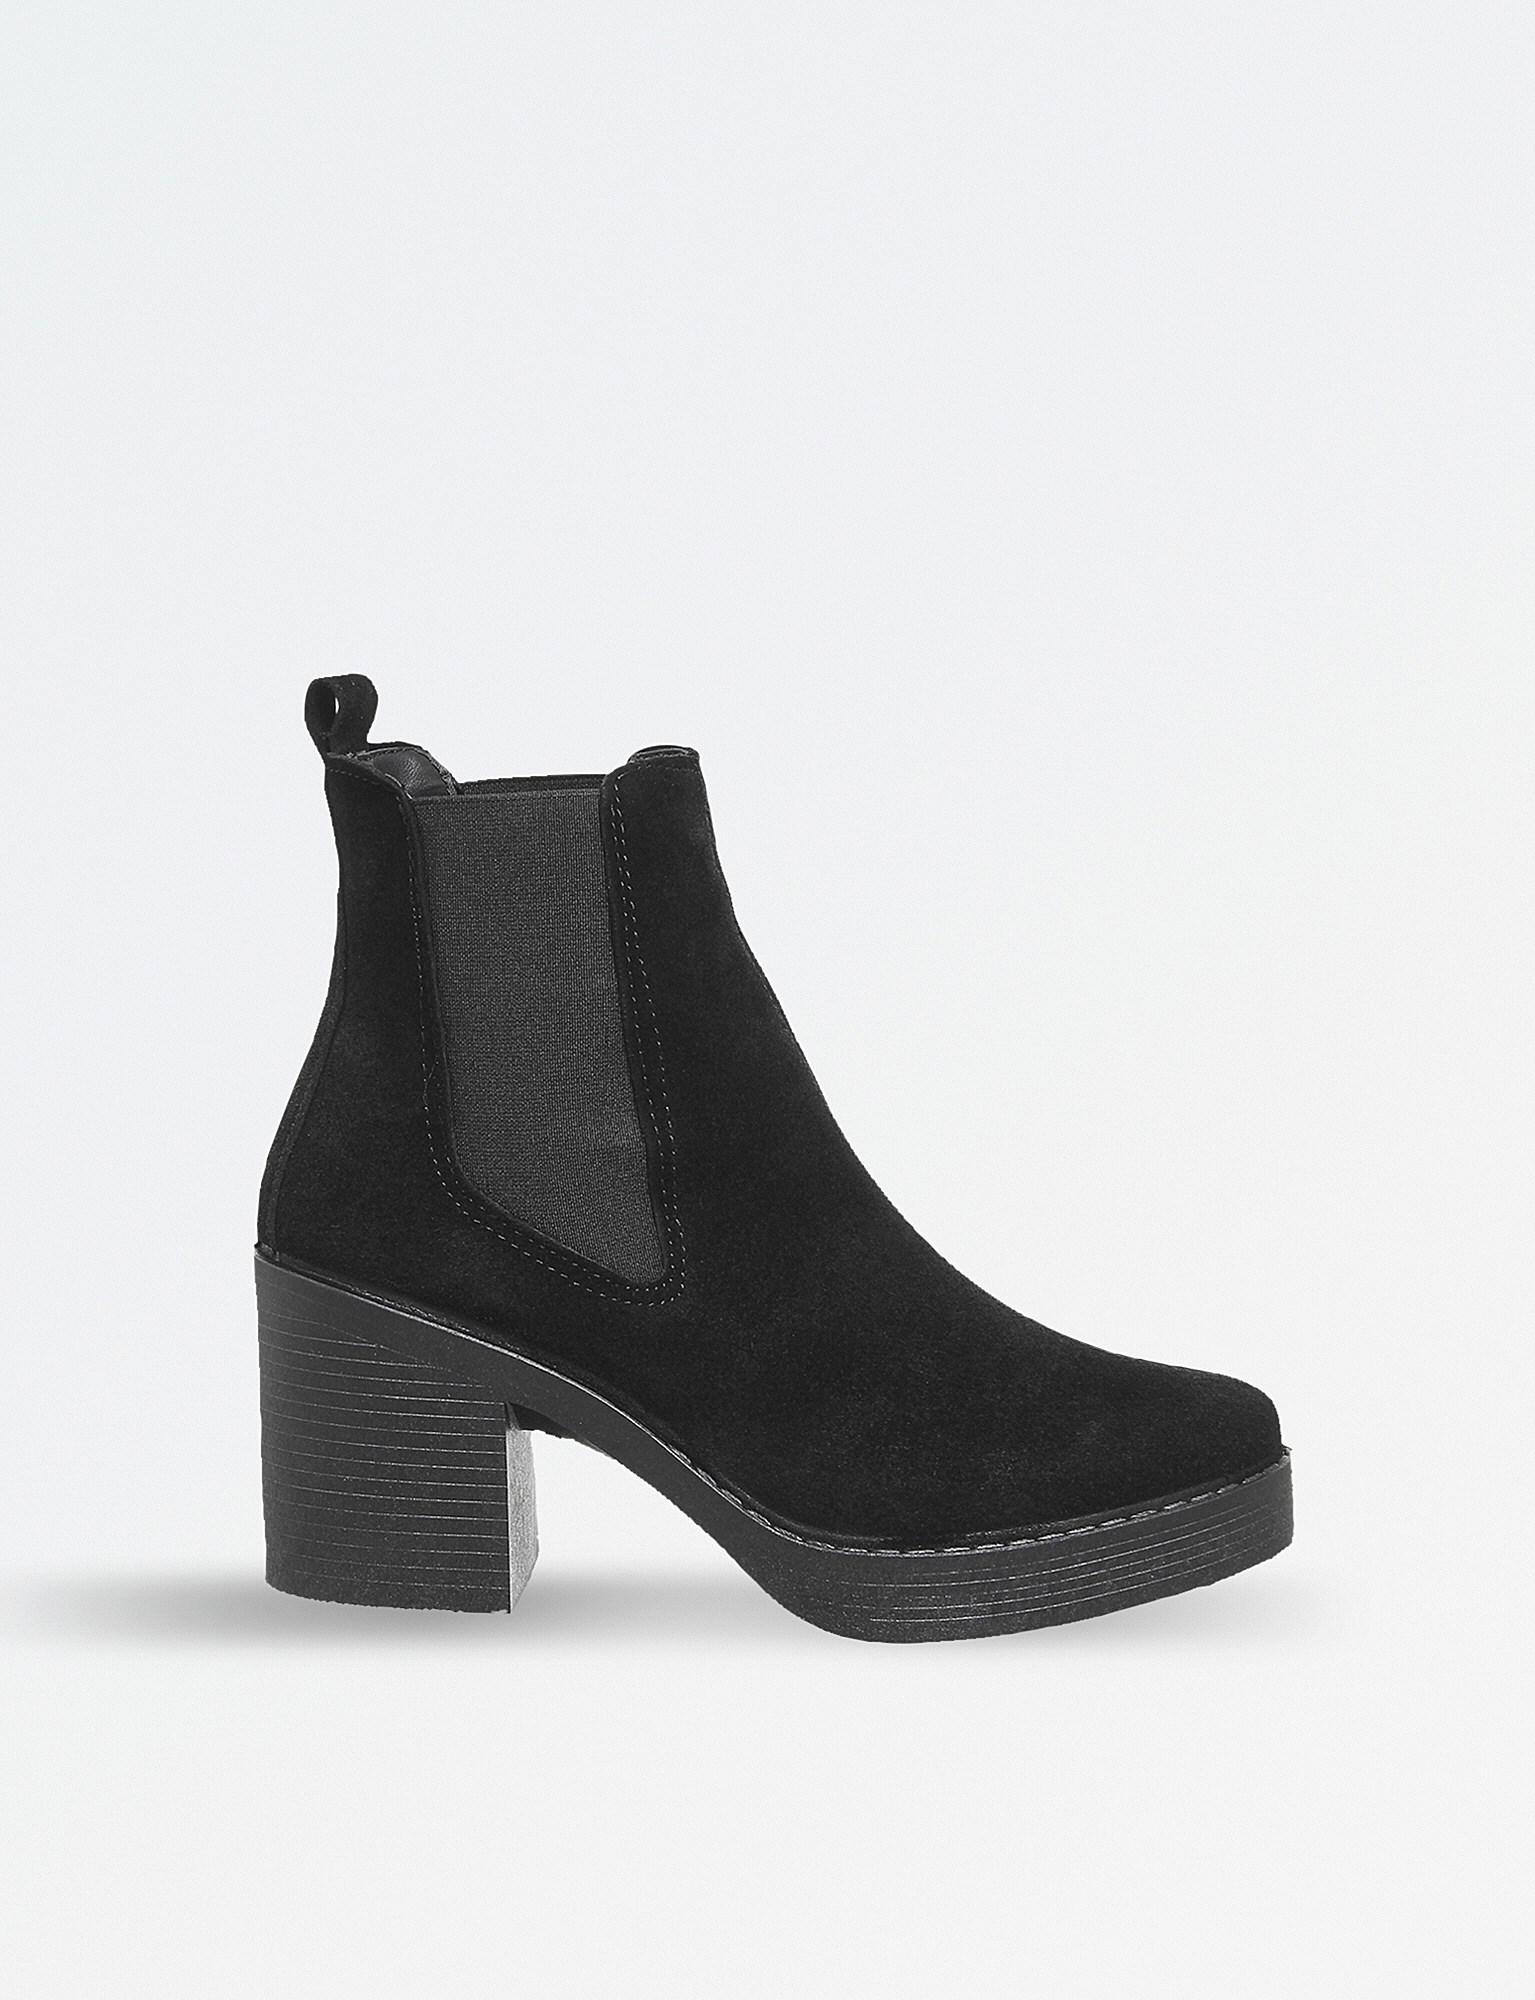 720c3287eef Office Alesha Suede Chelsea Boots in Black - Lyst